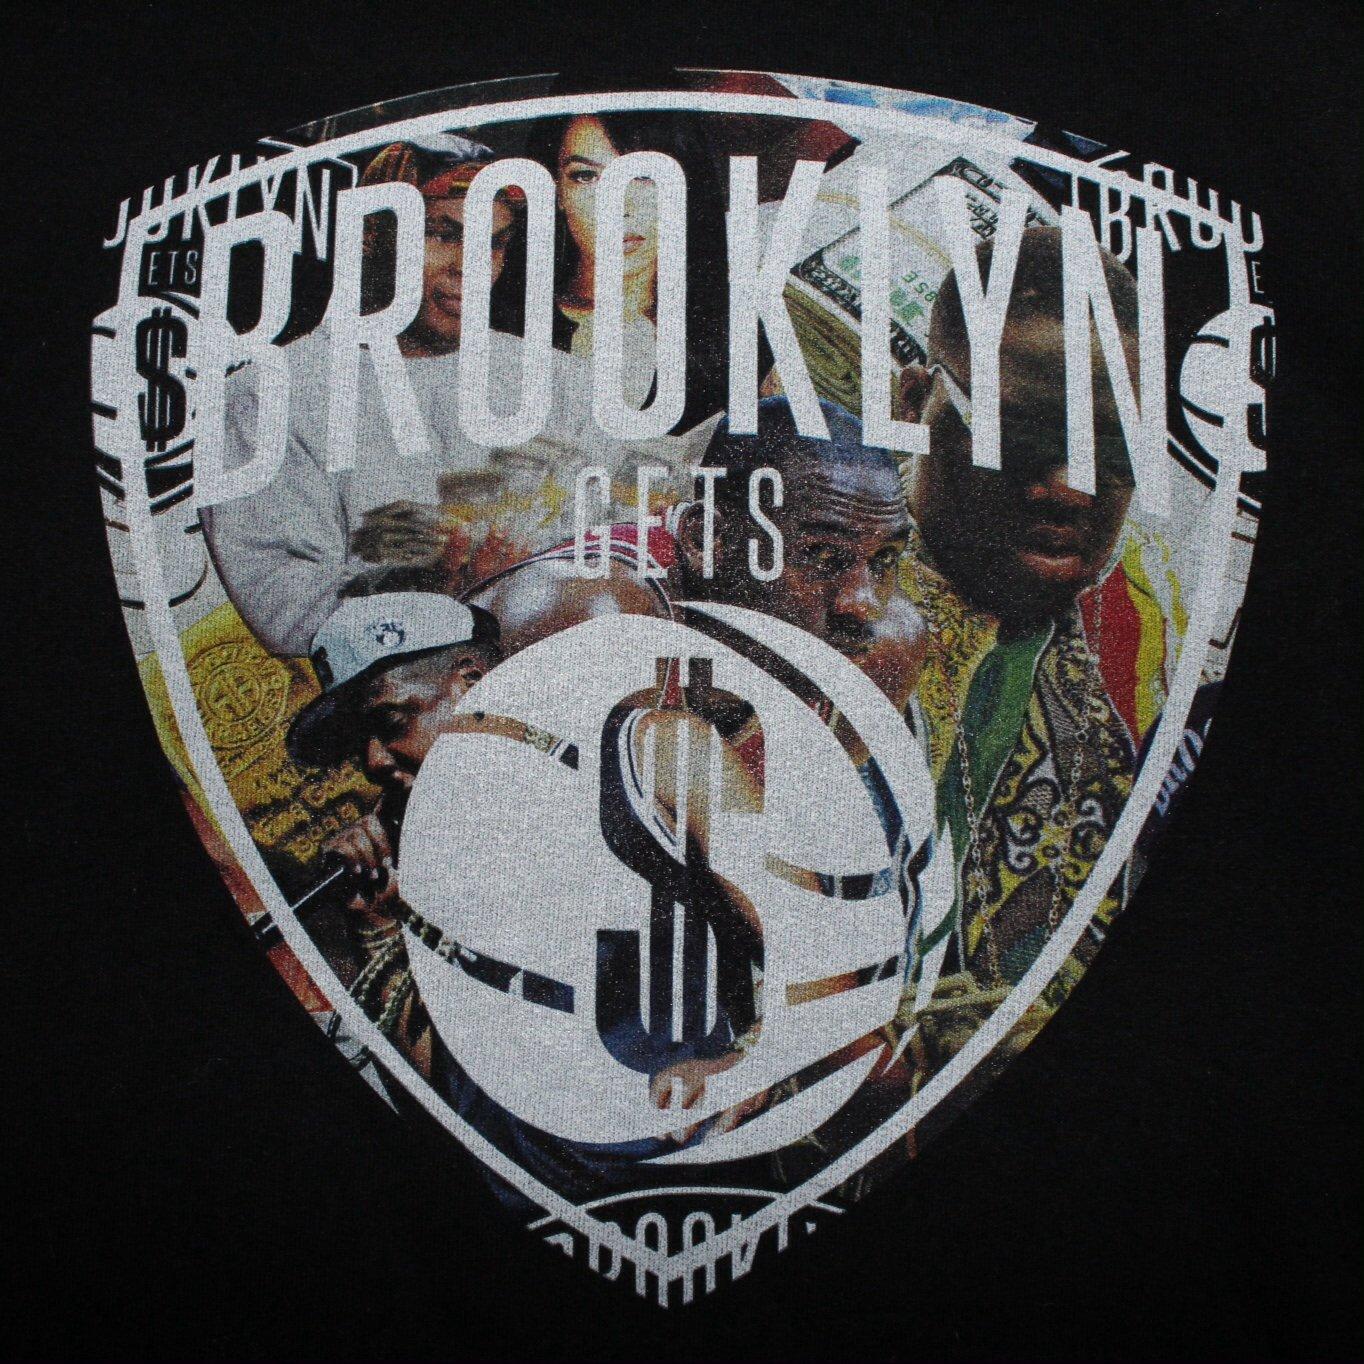 Image of Brooklyn Getz Emblem Tee / sweatshirt